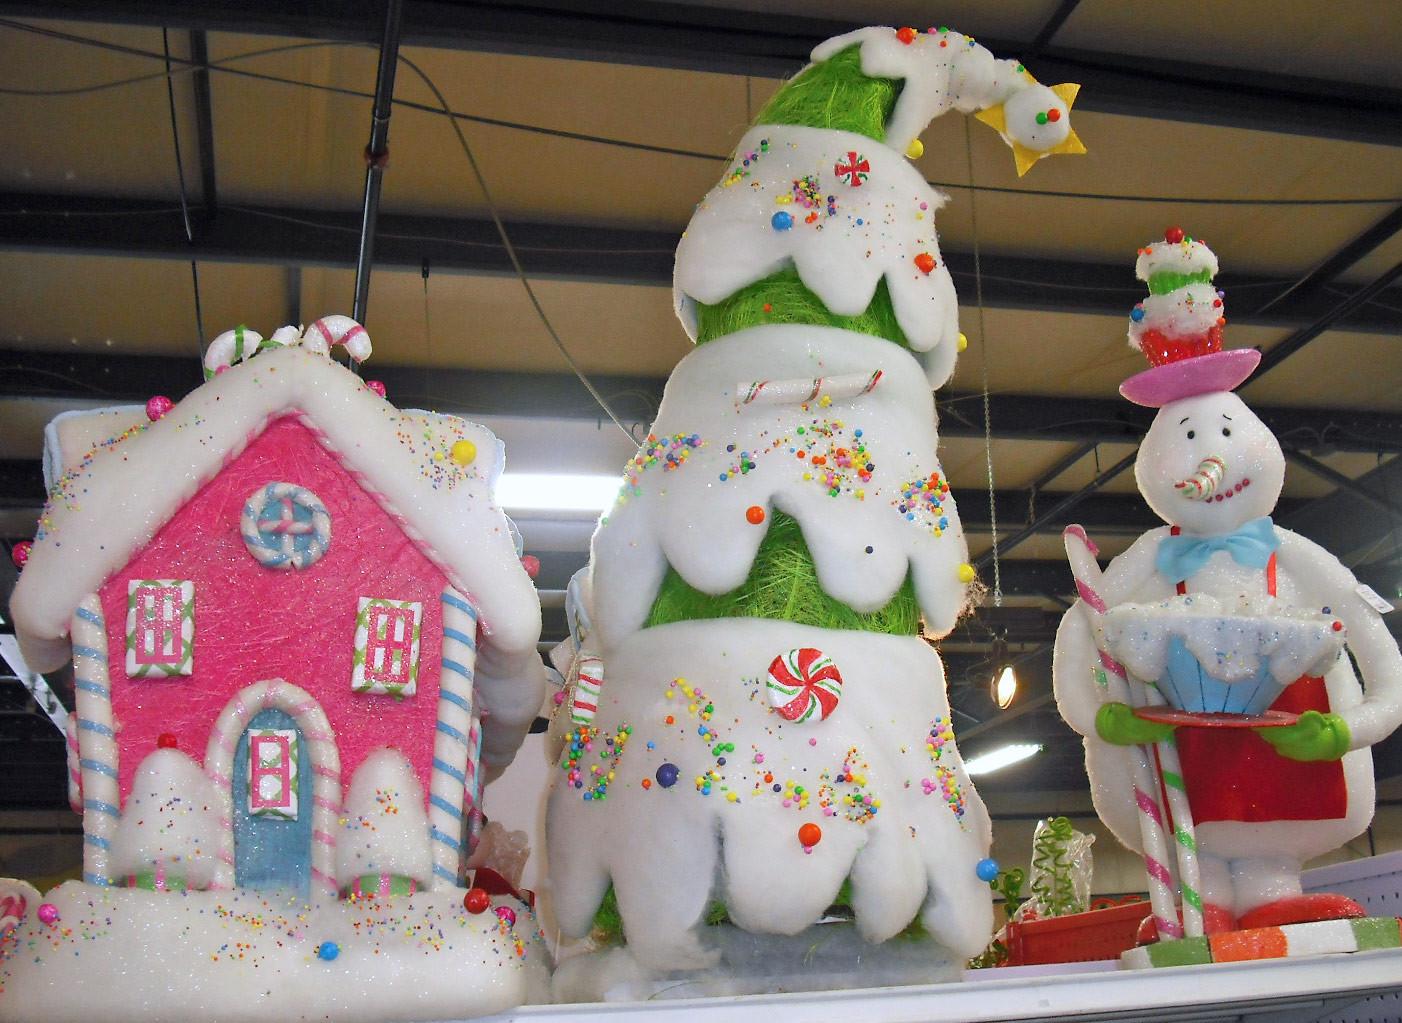 Candy Themed Christmas Decorations  Studio B UberArt Twelve Days of Christmas Trees Day 10